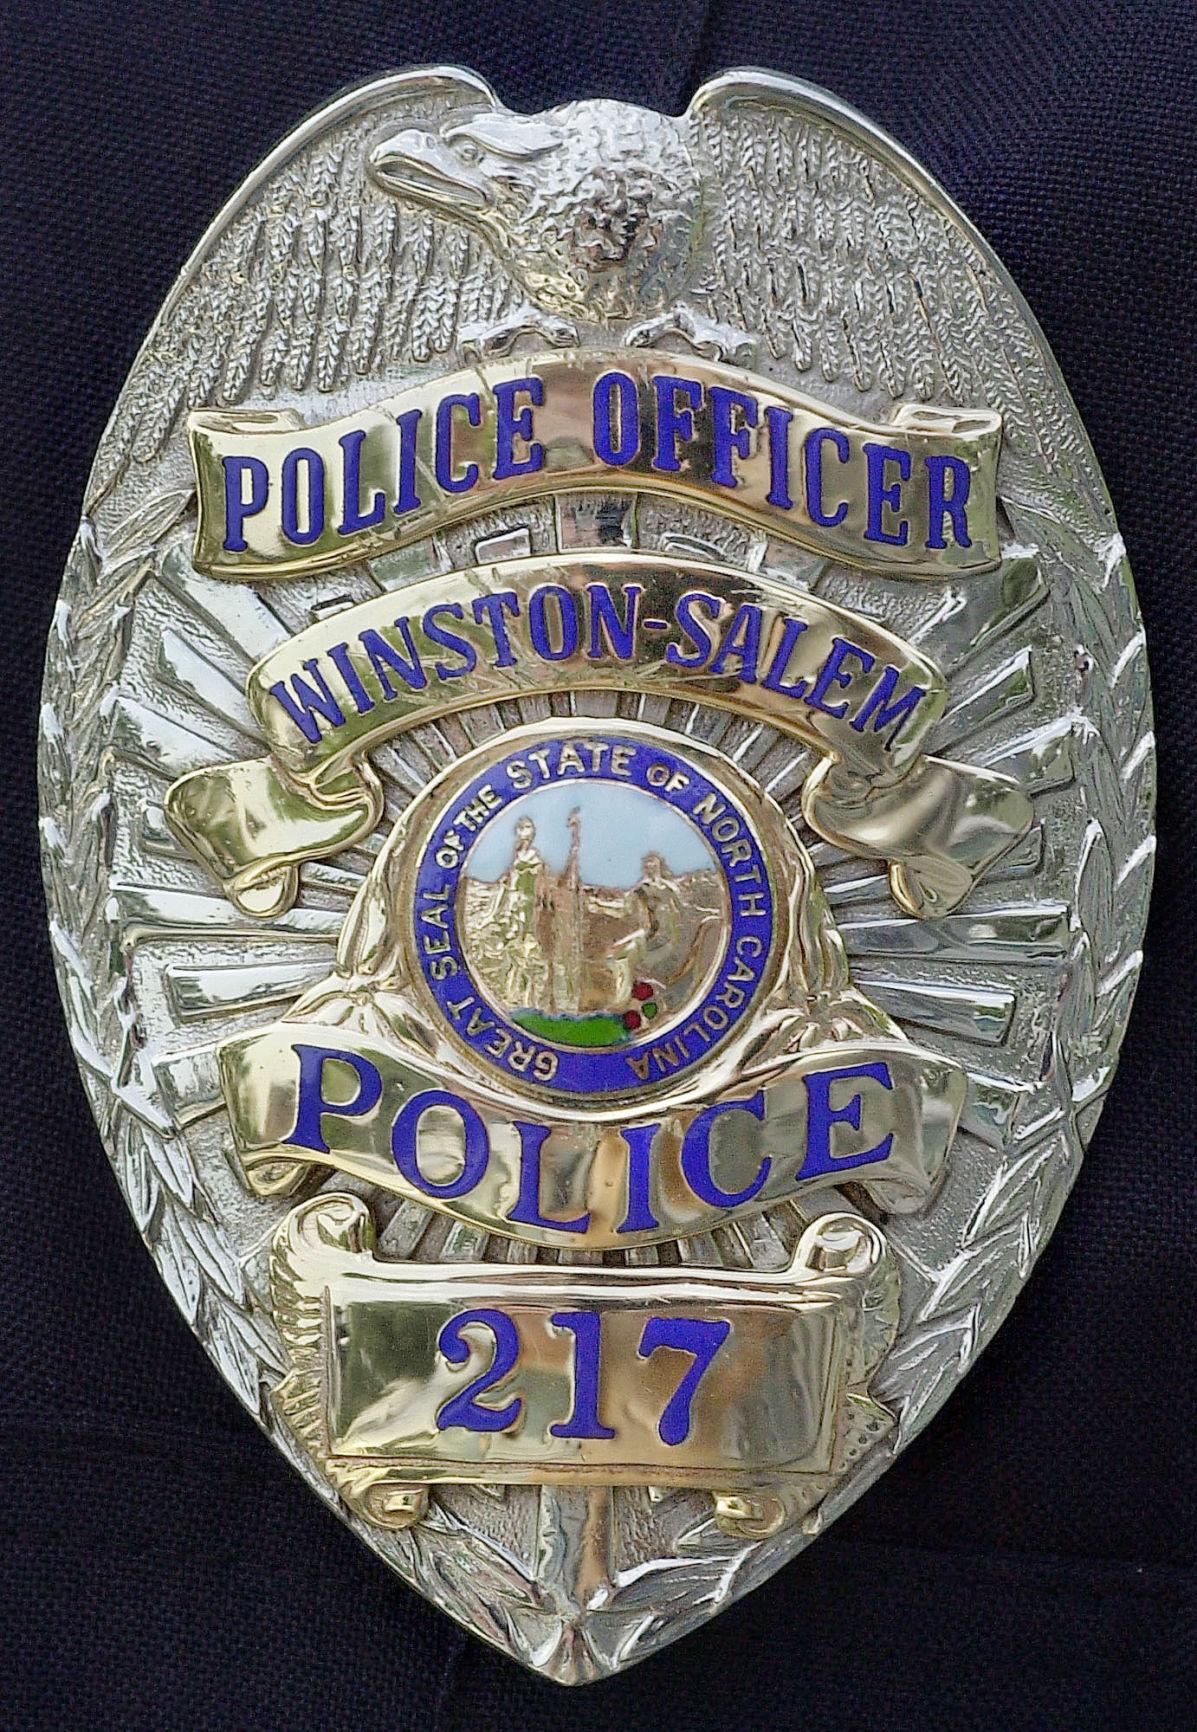 Winston-Salem man dies following arrest; three officers on ...